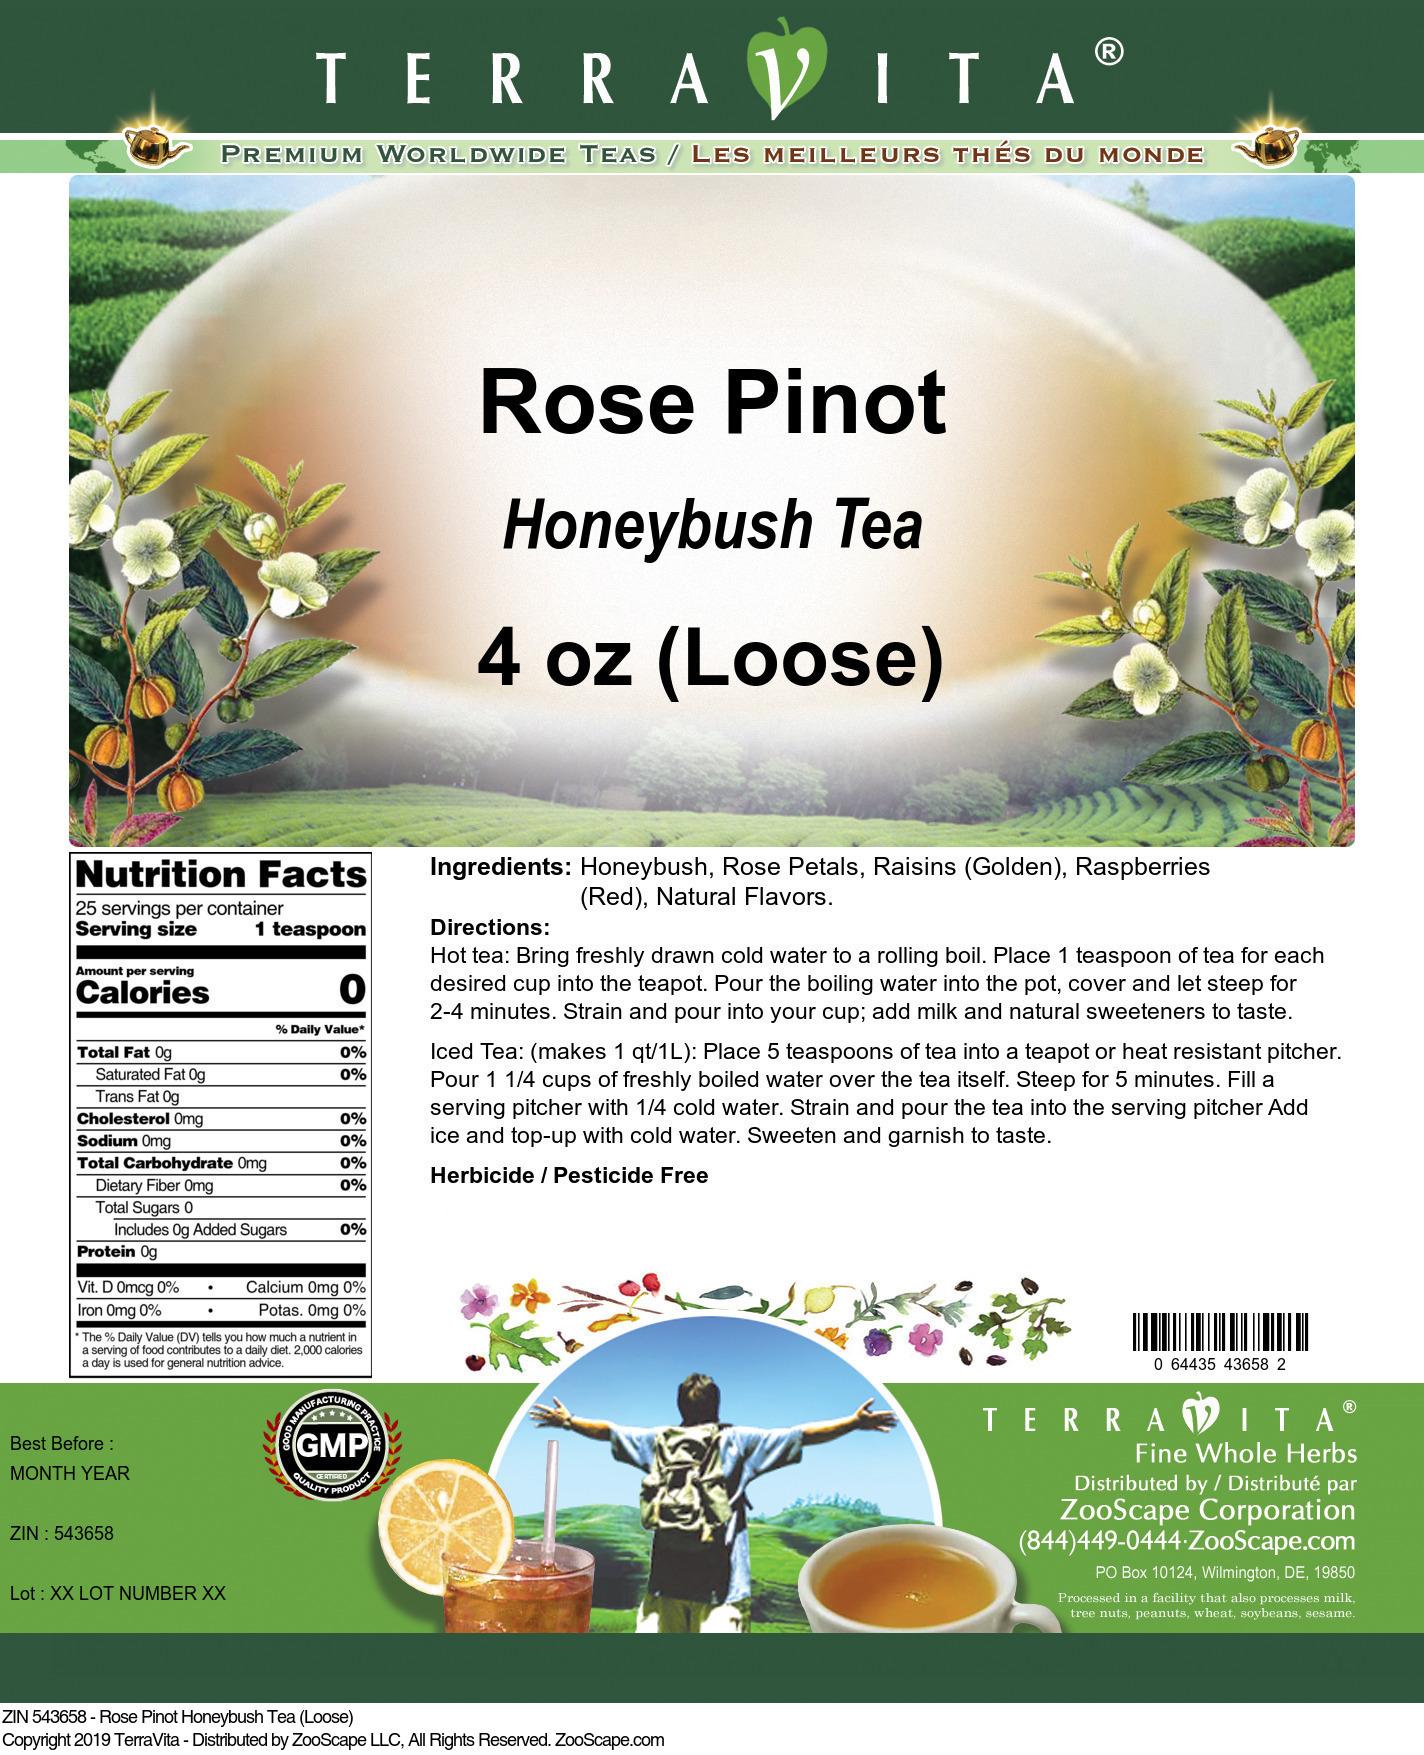 Rose Pinot Honeybush Tea (Loose)